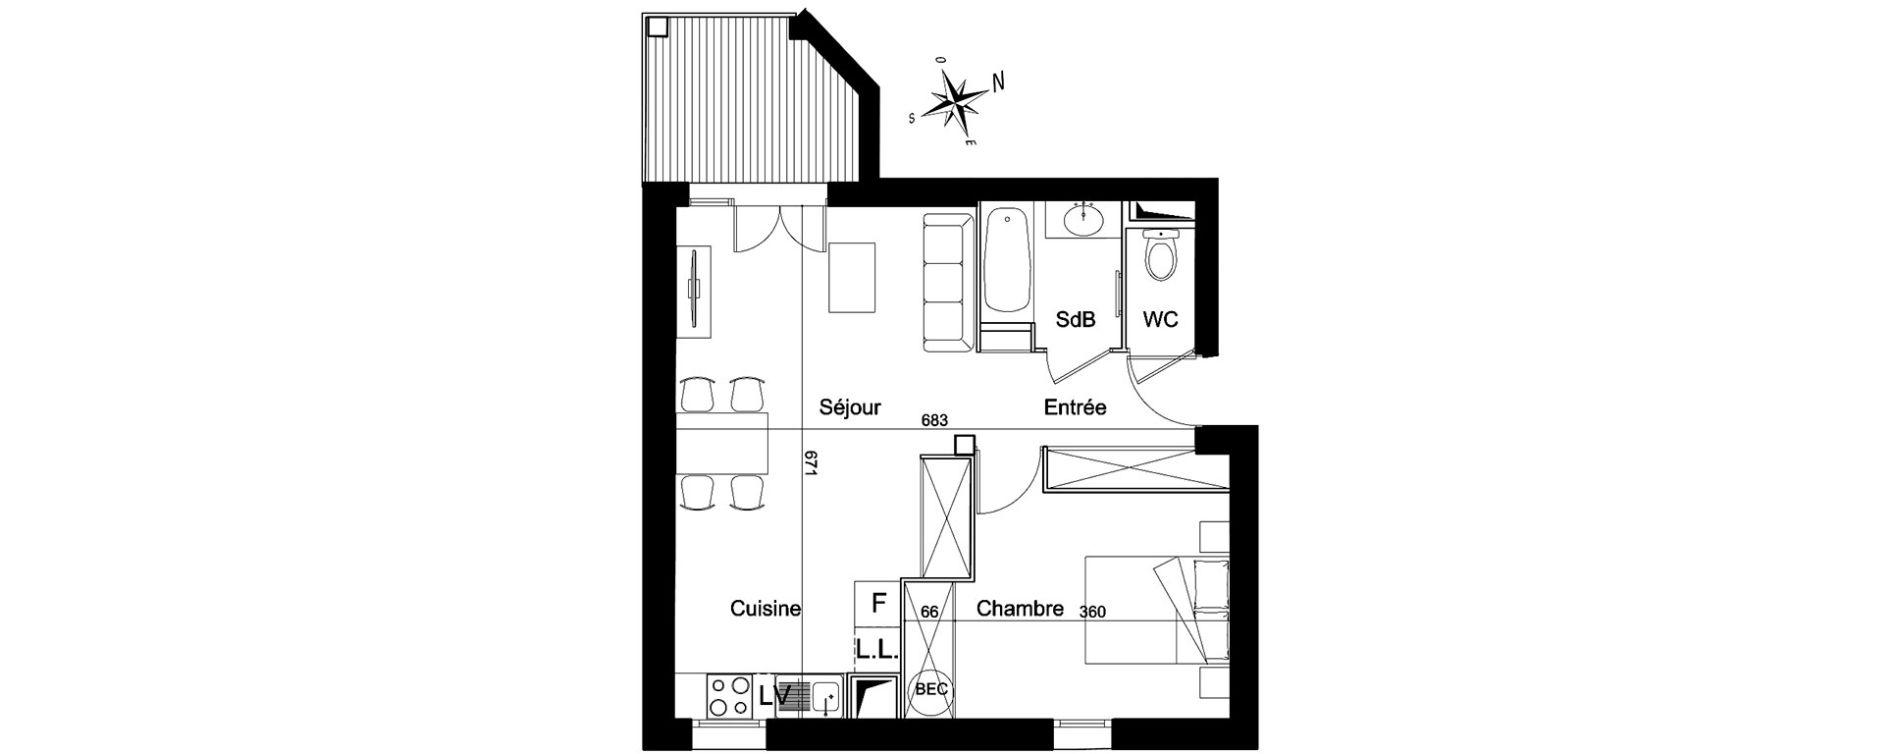 Plan T2 neuf à Eyne de